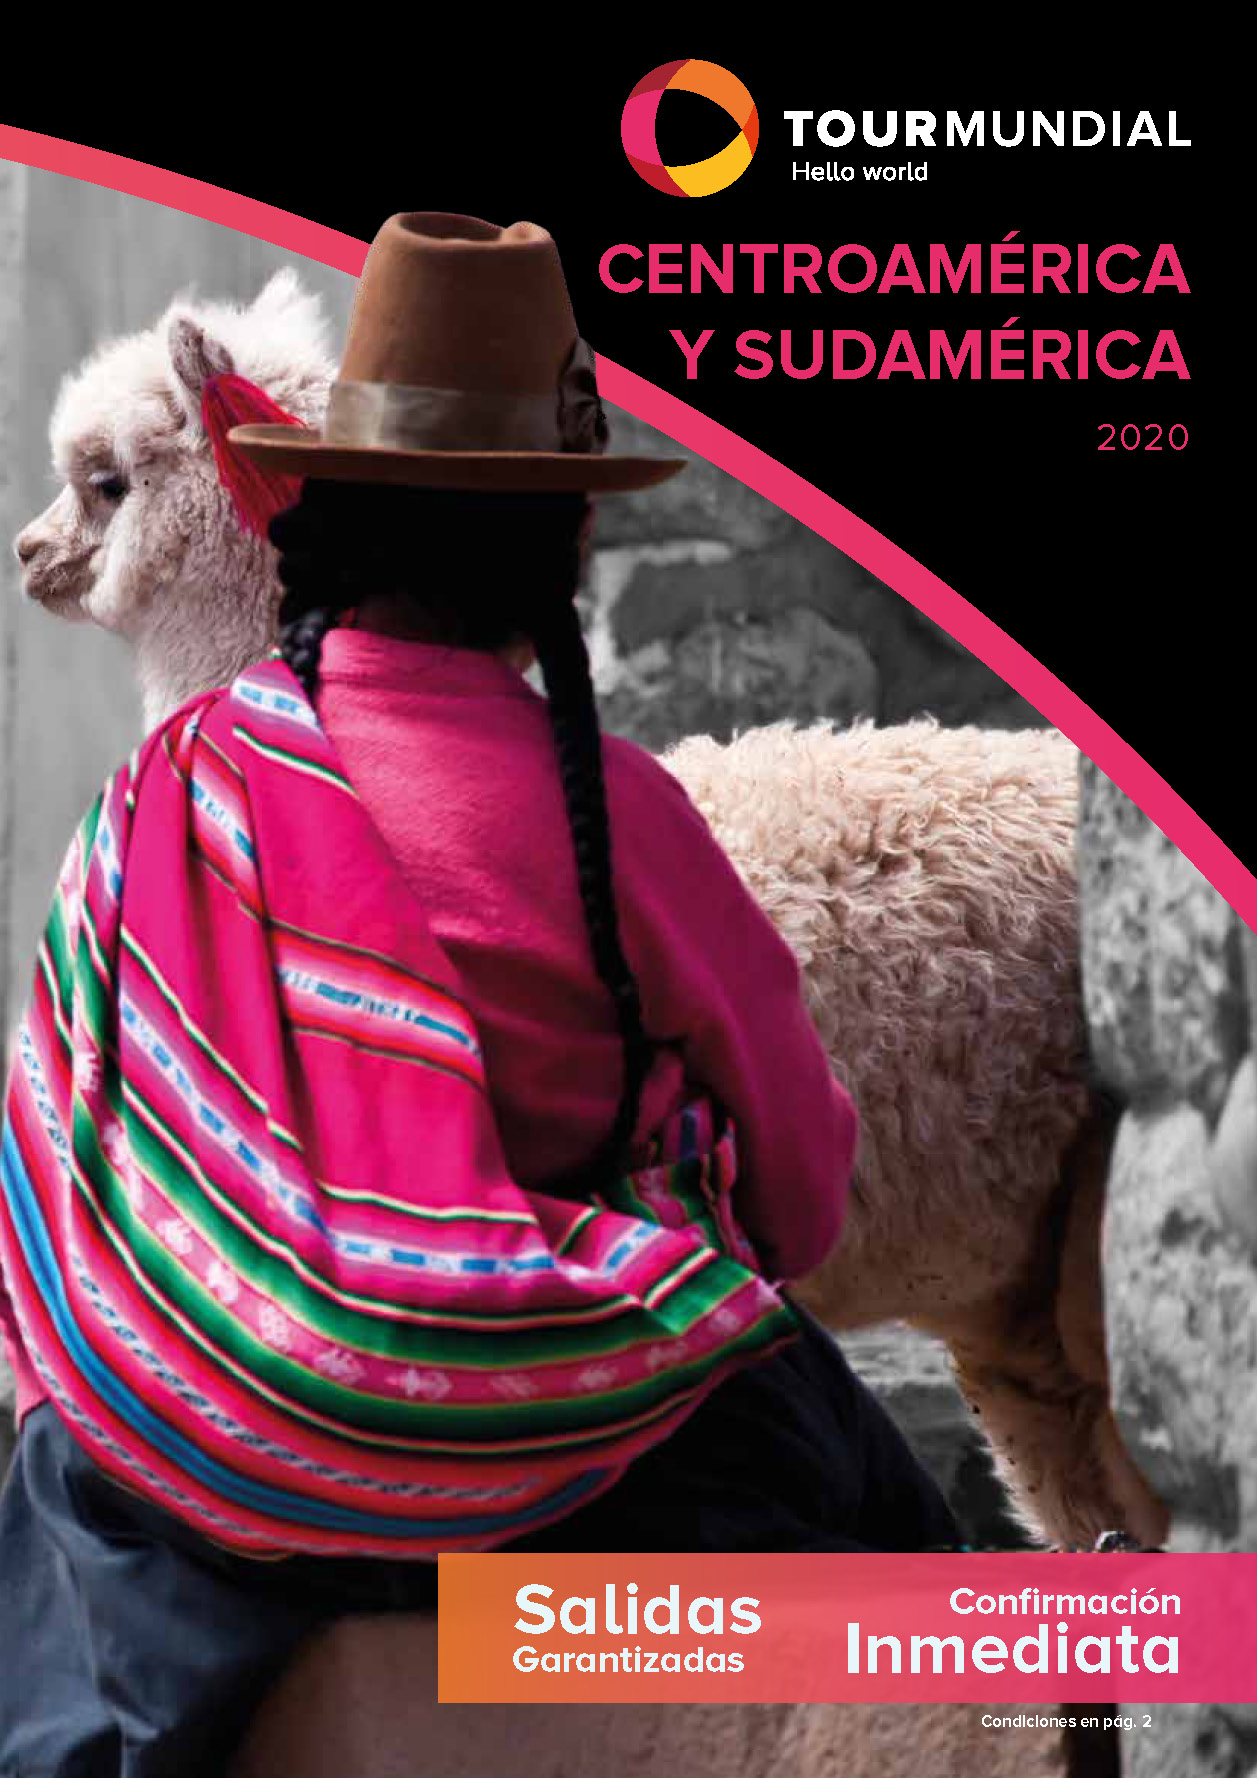 Catalogo Tourmundial Centroamerica y Sudamerica 2020